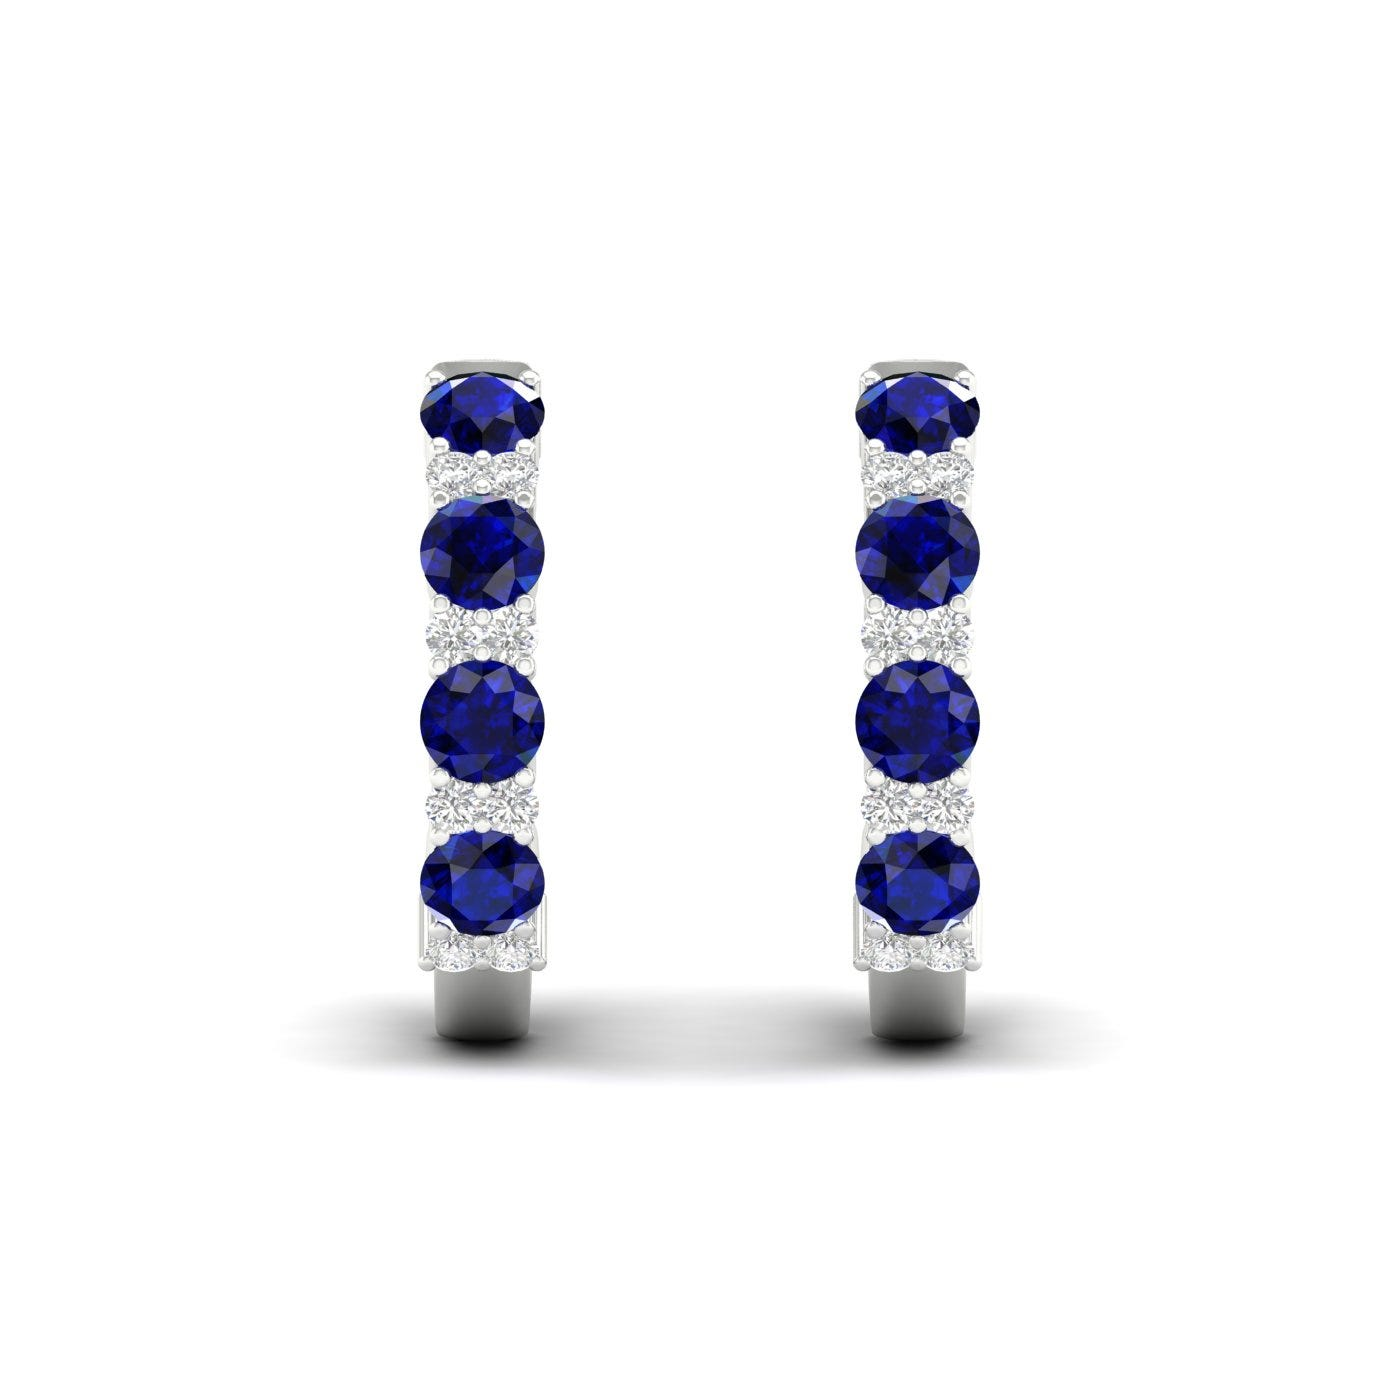 Blue Sapphire & Diamond Hoop Earrings in 10k White Gold